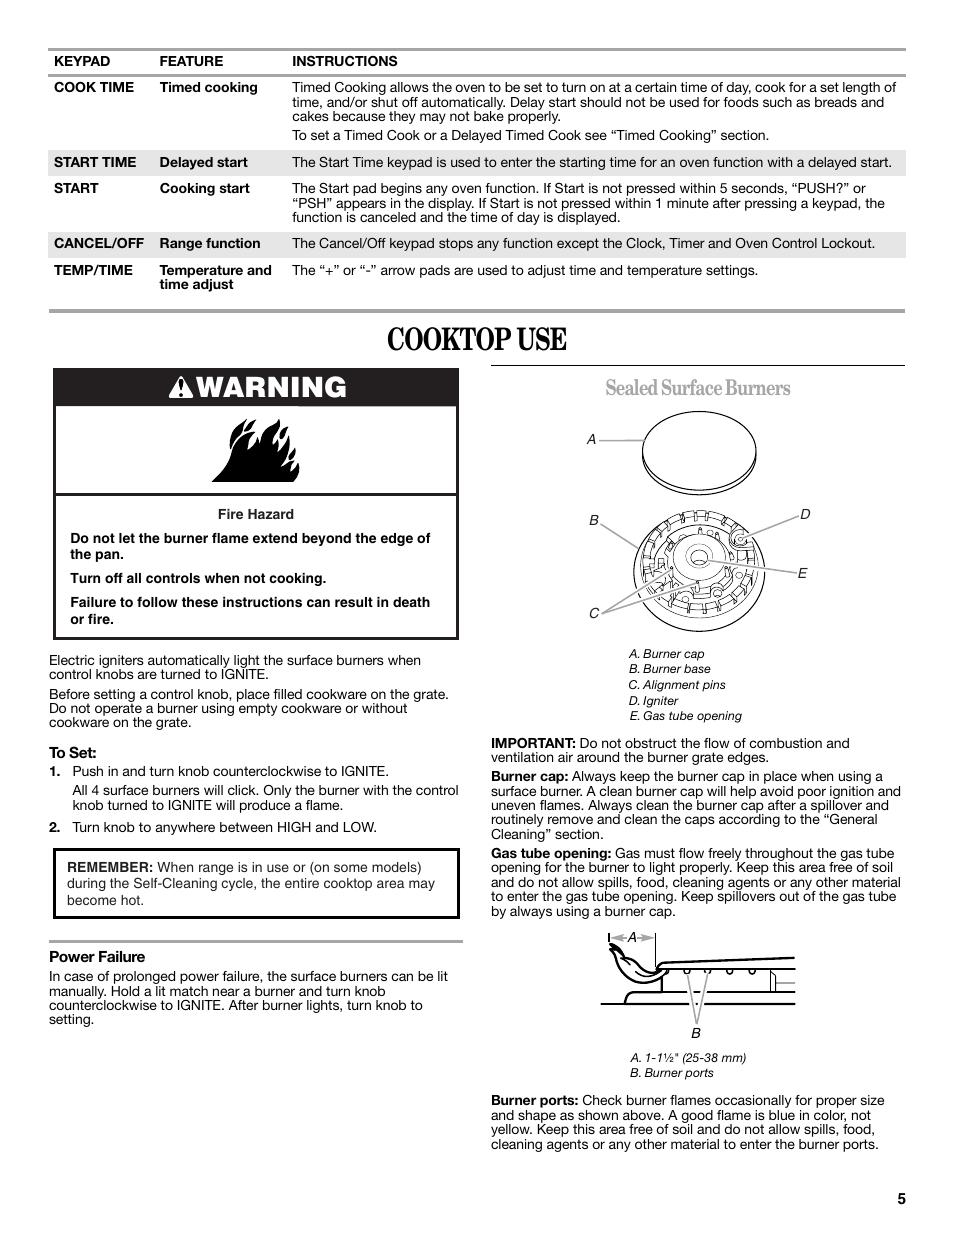 cooktop use warning sealed surface burners whirlpool wfg361lvs rh manualsdir com Whirlpool Dryer Manual Whirlpool Quiet Partner II